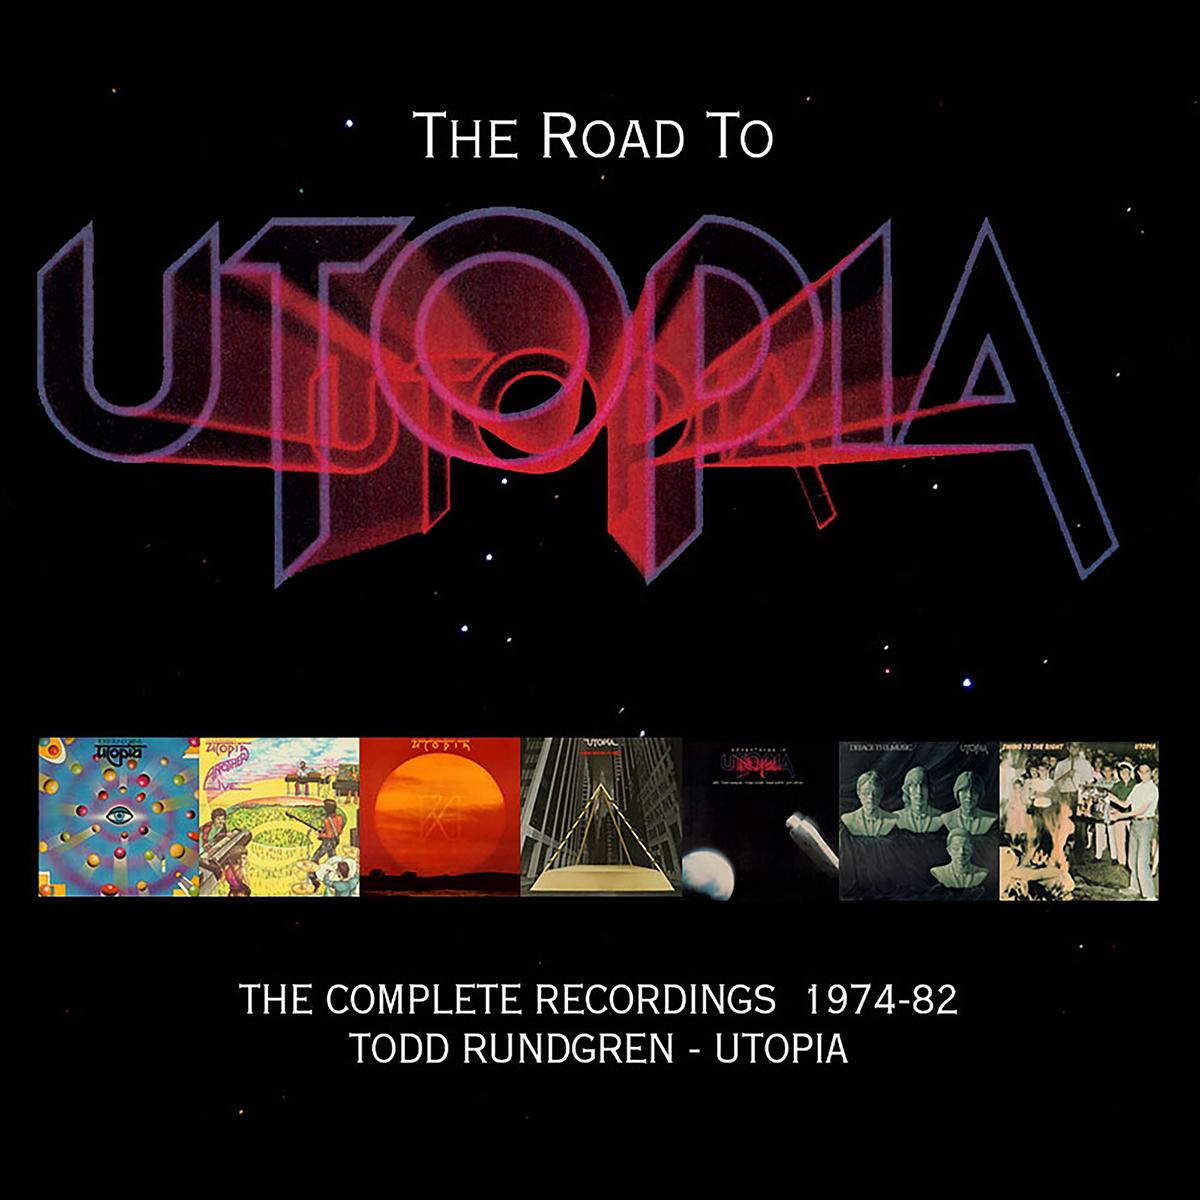 TODD RUNDGREN-UTOPIA - THE ROAD TO UTOPIA-THE COMPLETE RECORDINGS 1974-82 CD